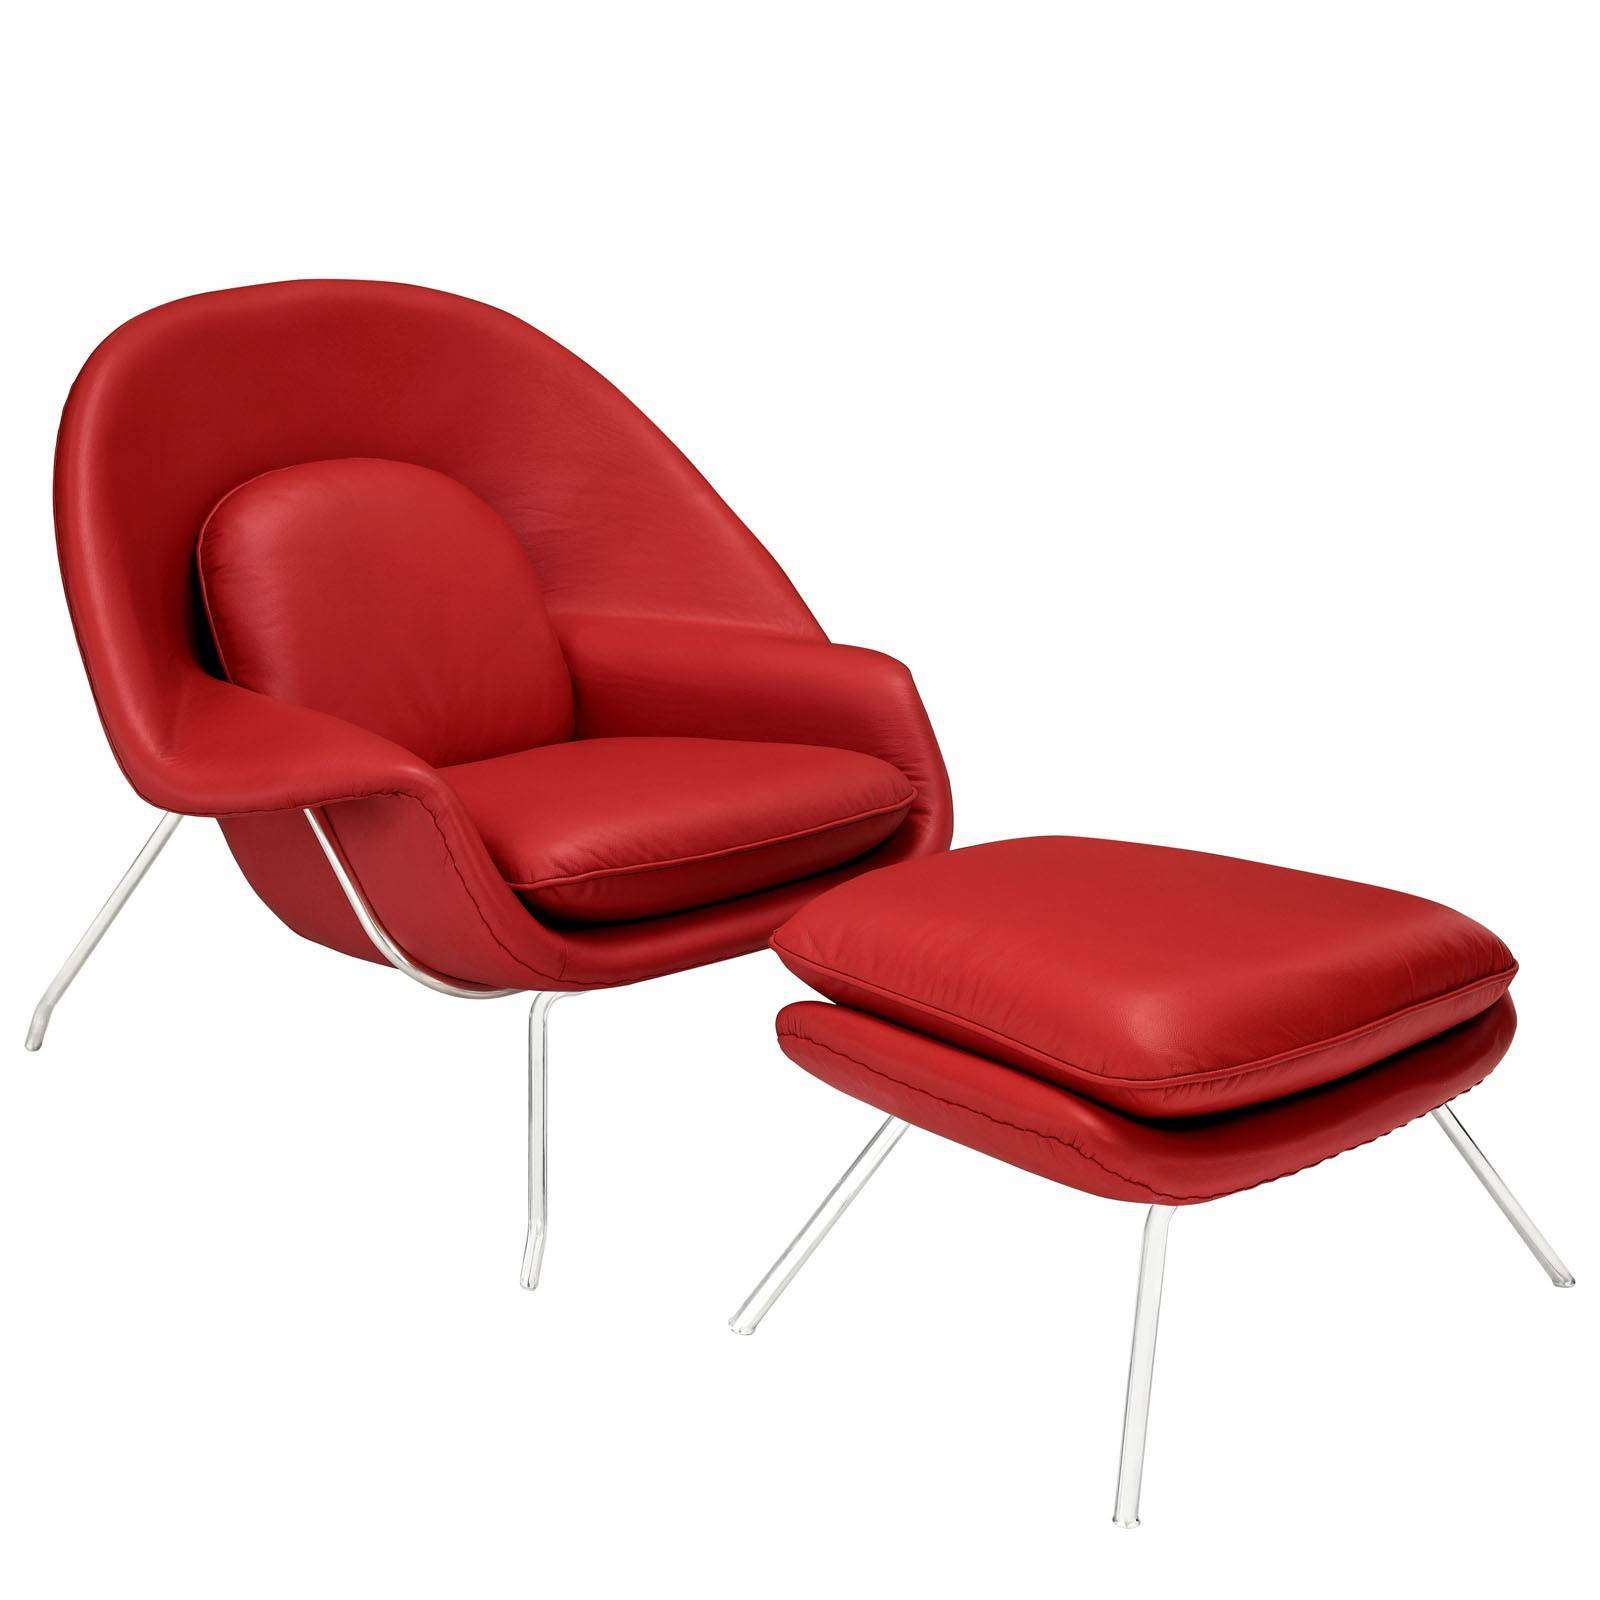 Eero Saarinen Womb Lounge Chair Ottoman Leather